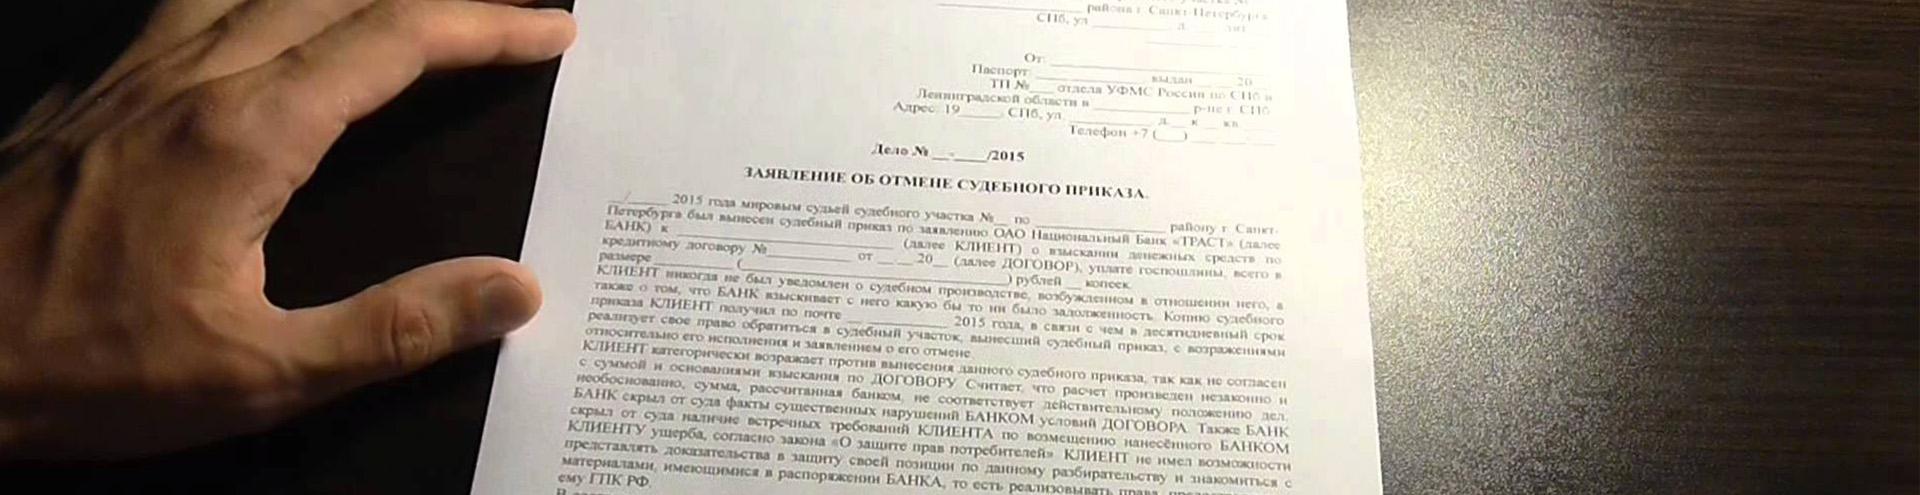 отмена судебного приказа в Самаре и Самарской области